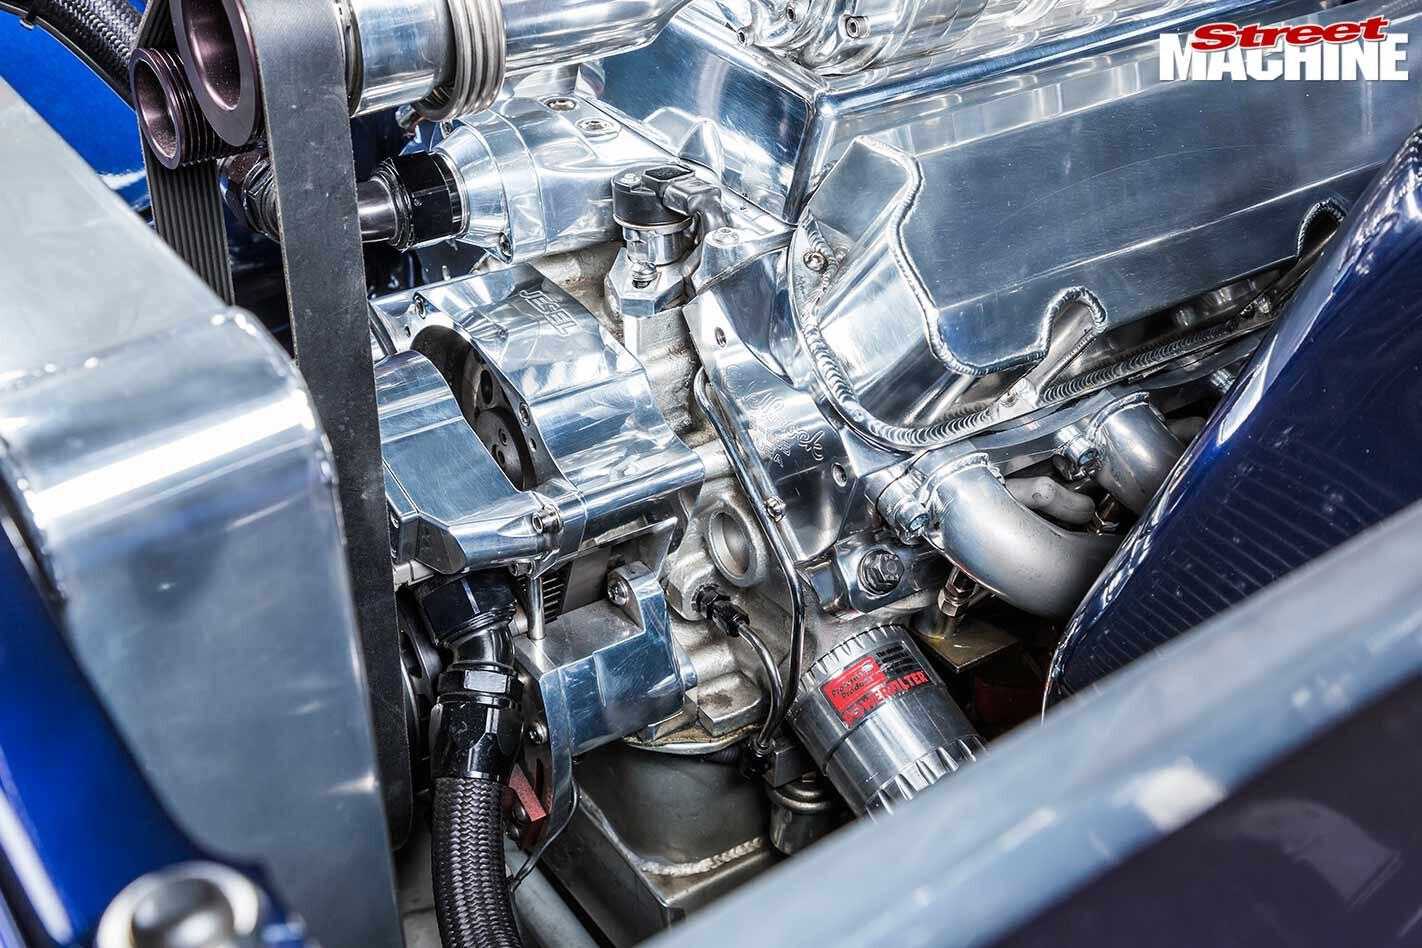 Ford ZB Fairlane engine bay